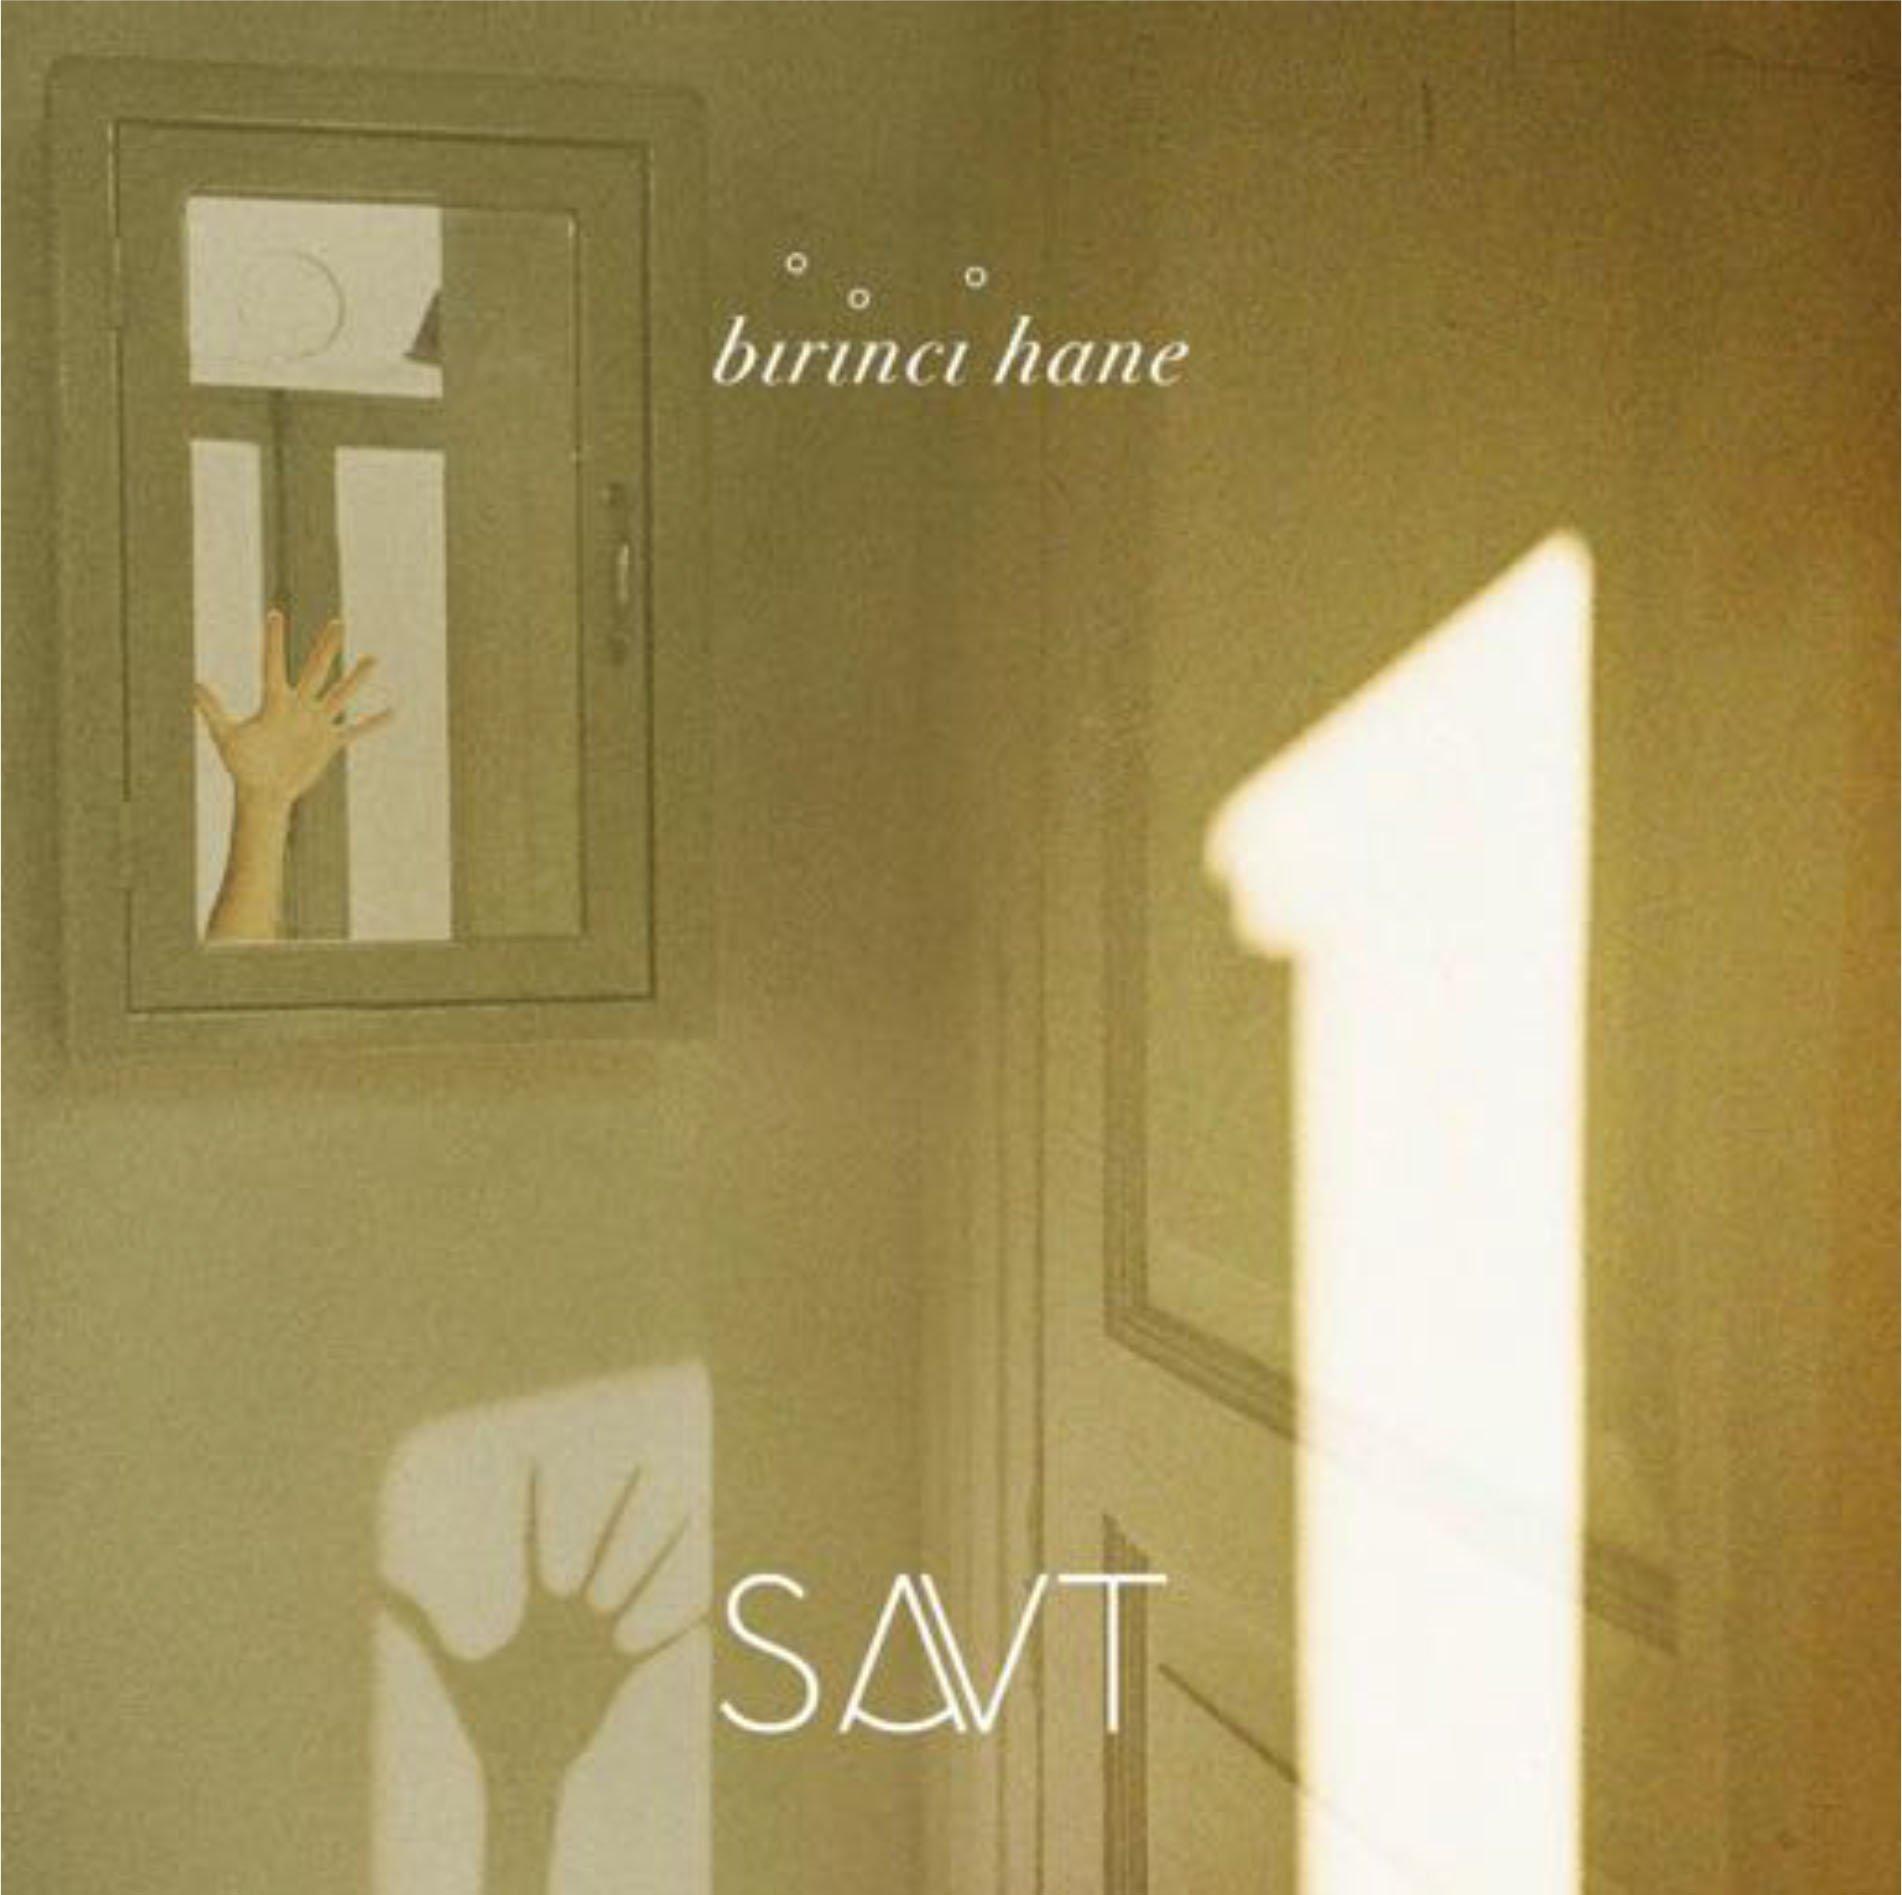 The cover of SAVT's first album 'Birinci Hane.' (Courtesy of SAVT)